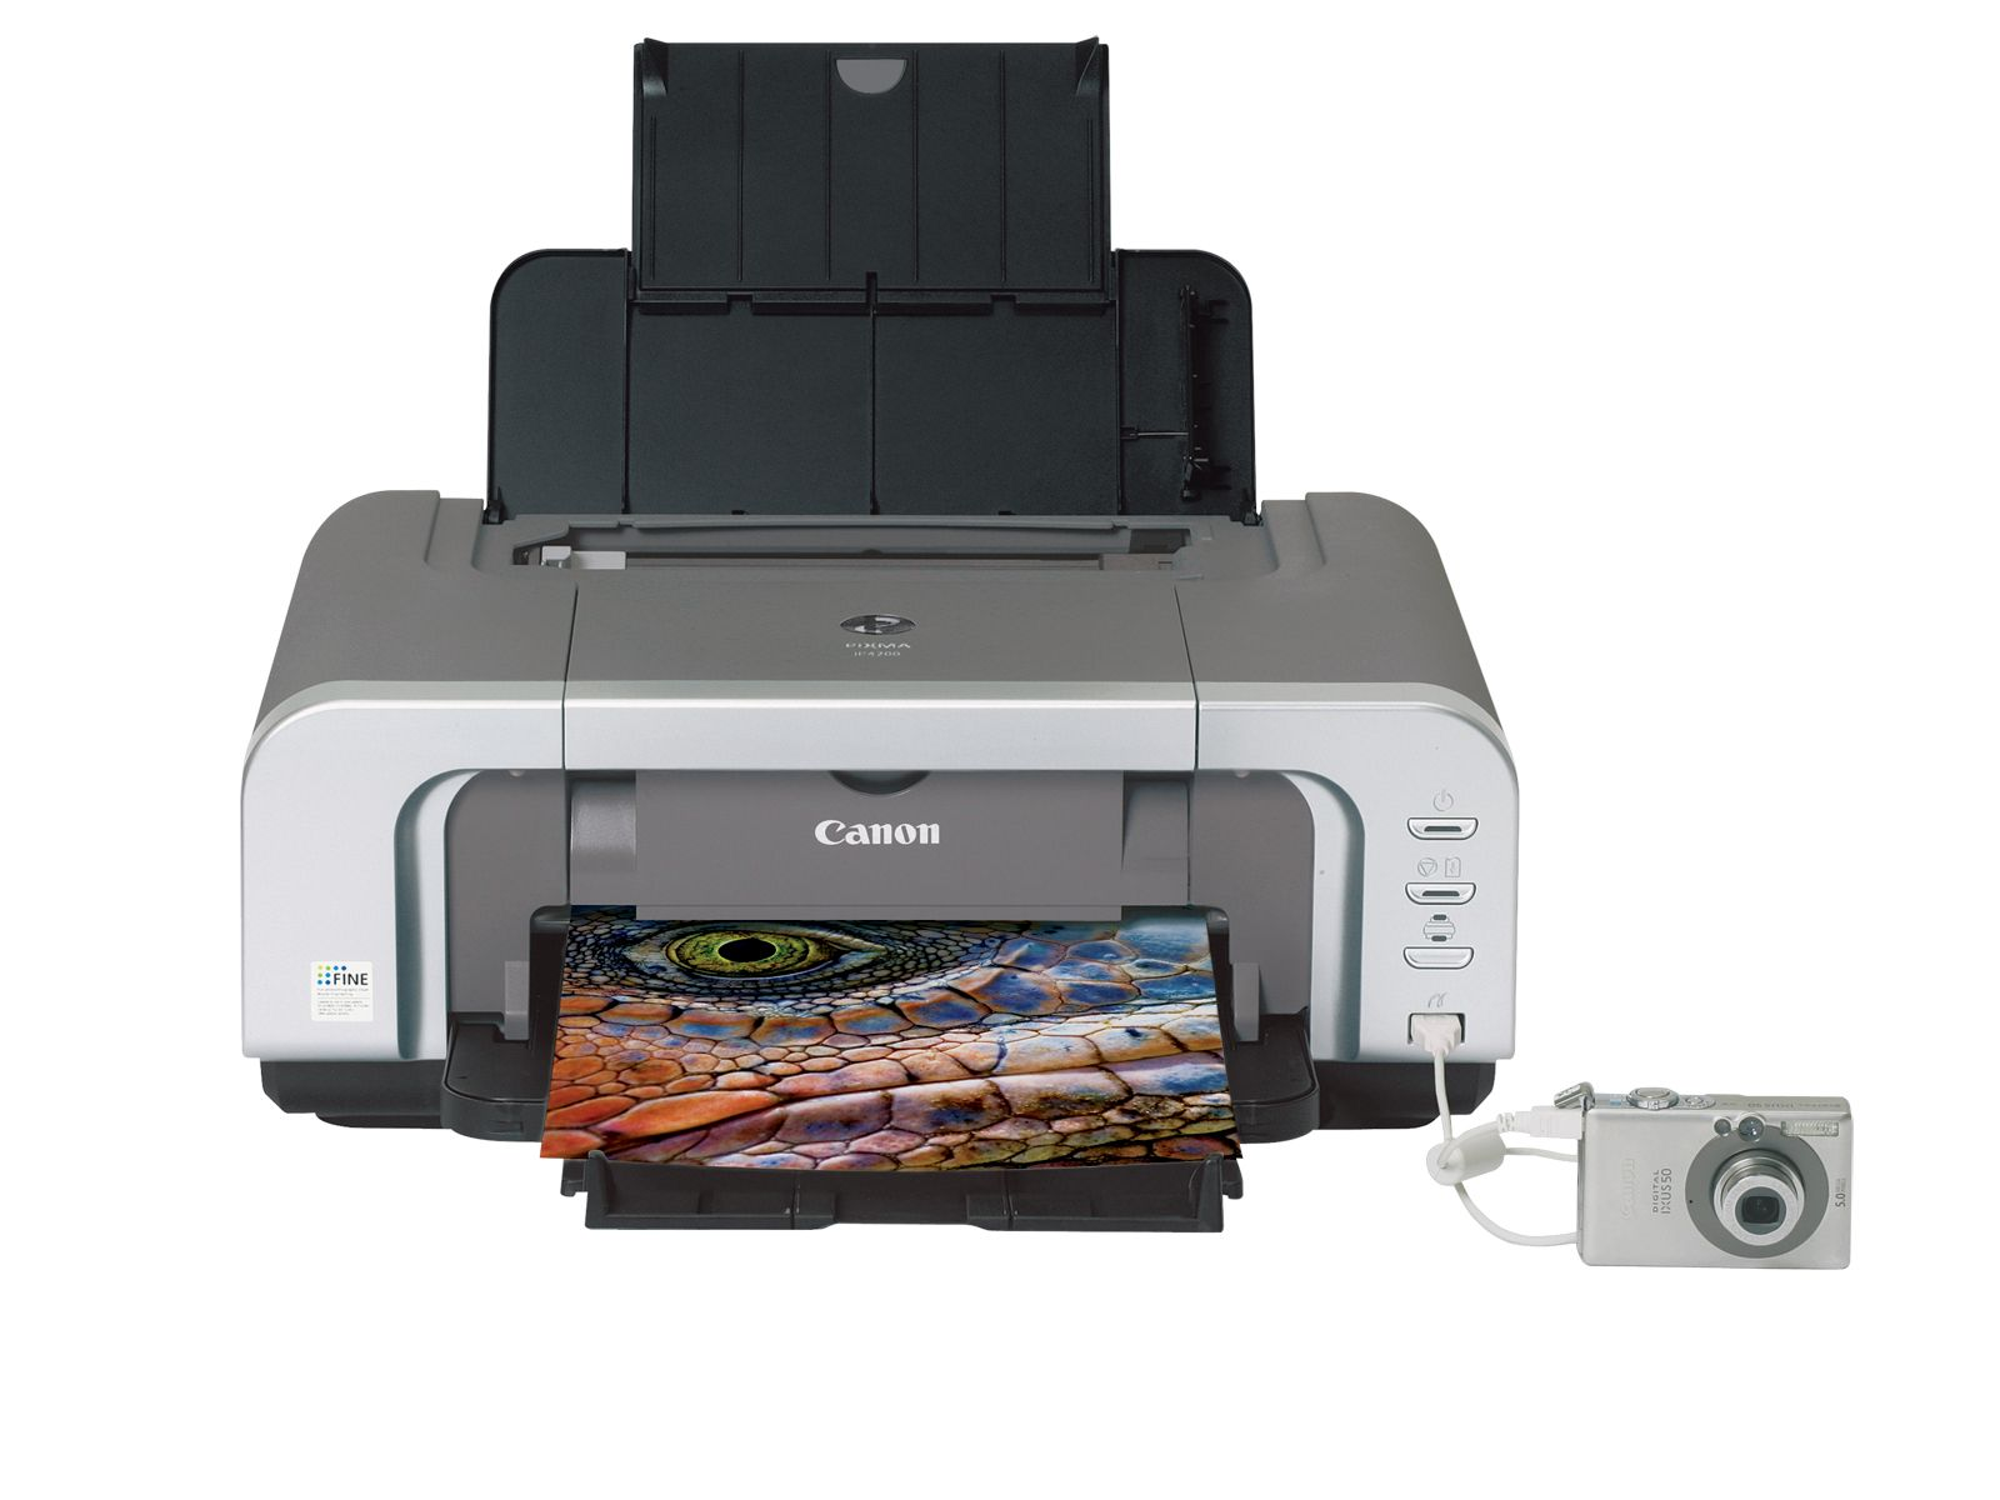 Canon usa : windows 7 : pixma mp250 drivers software canon pixma mp250 - струминн фотопринтери